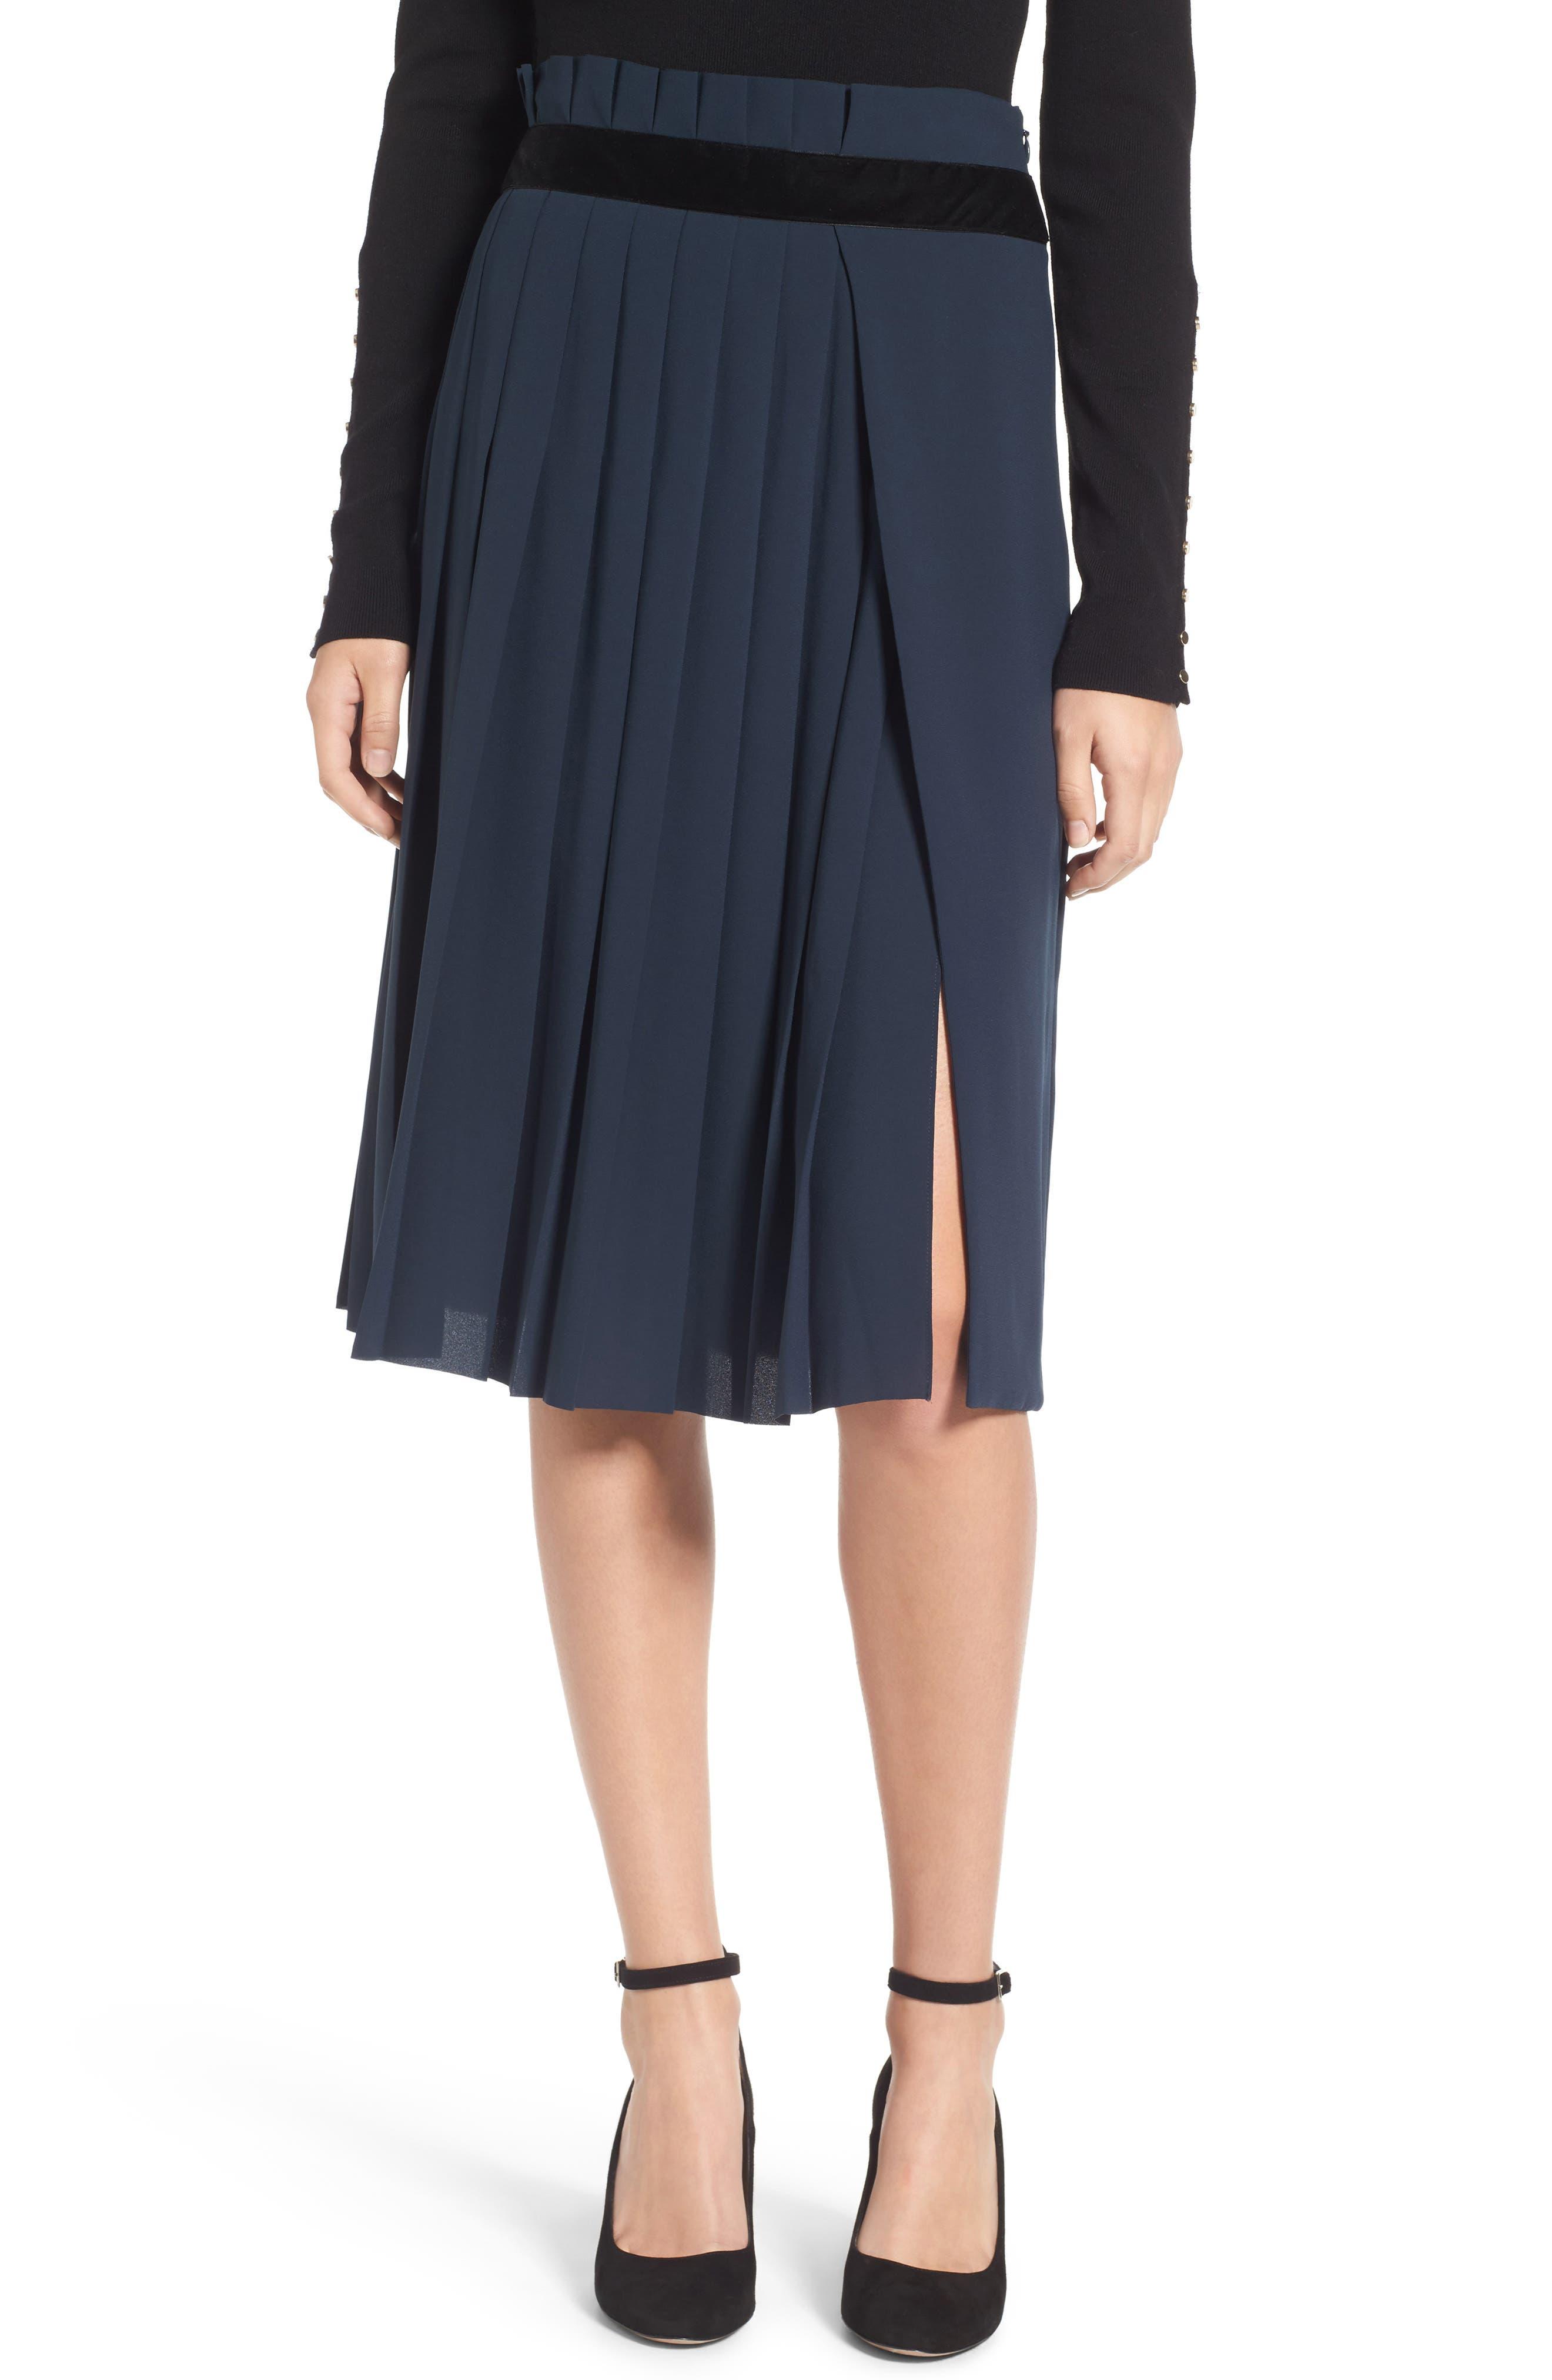 Alternate Image 1 Selected - Lewit Velvet Trim Pleated Crepe Skirt